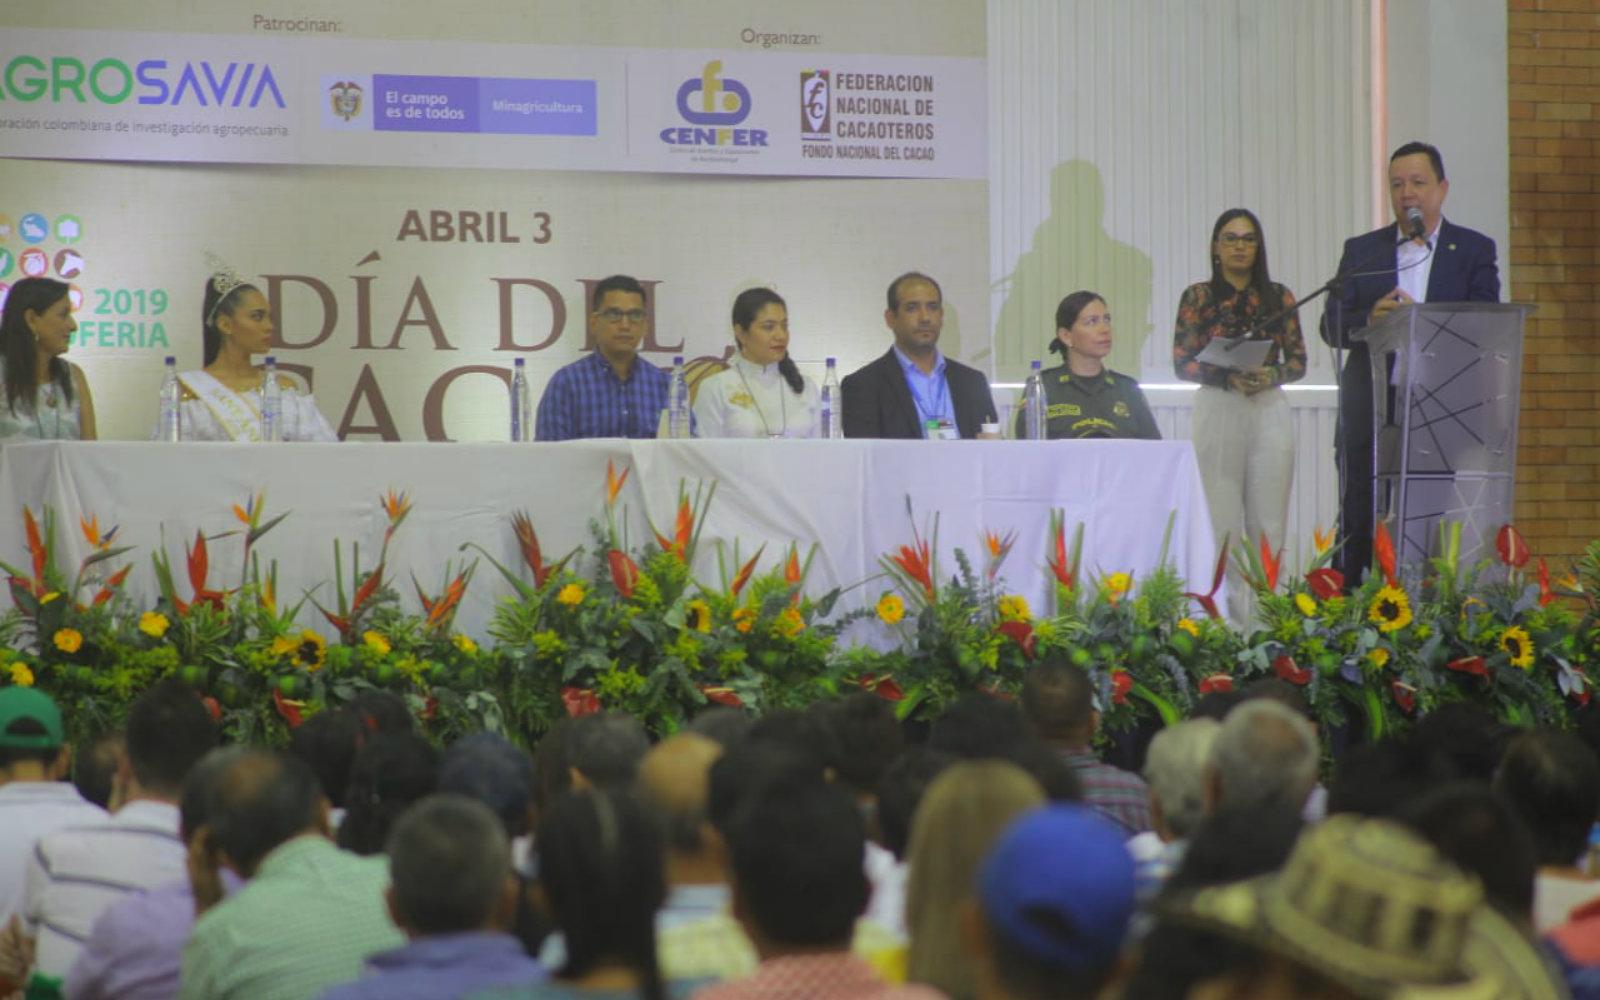 AGROSAVIA se vinculó al día del cacaocultor en Agroferia 2019